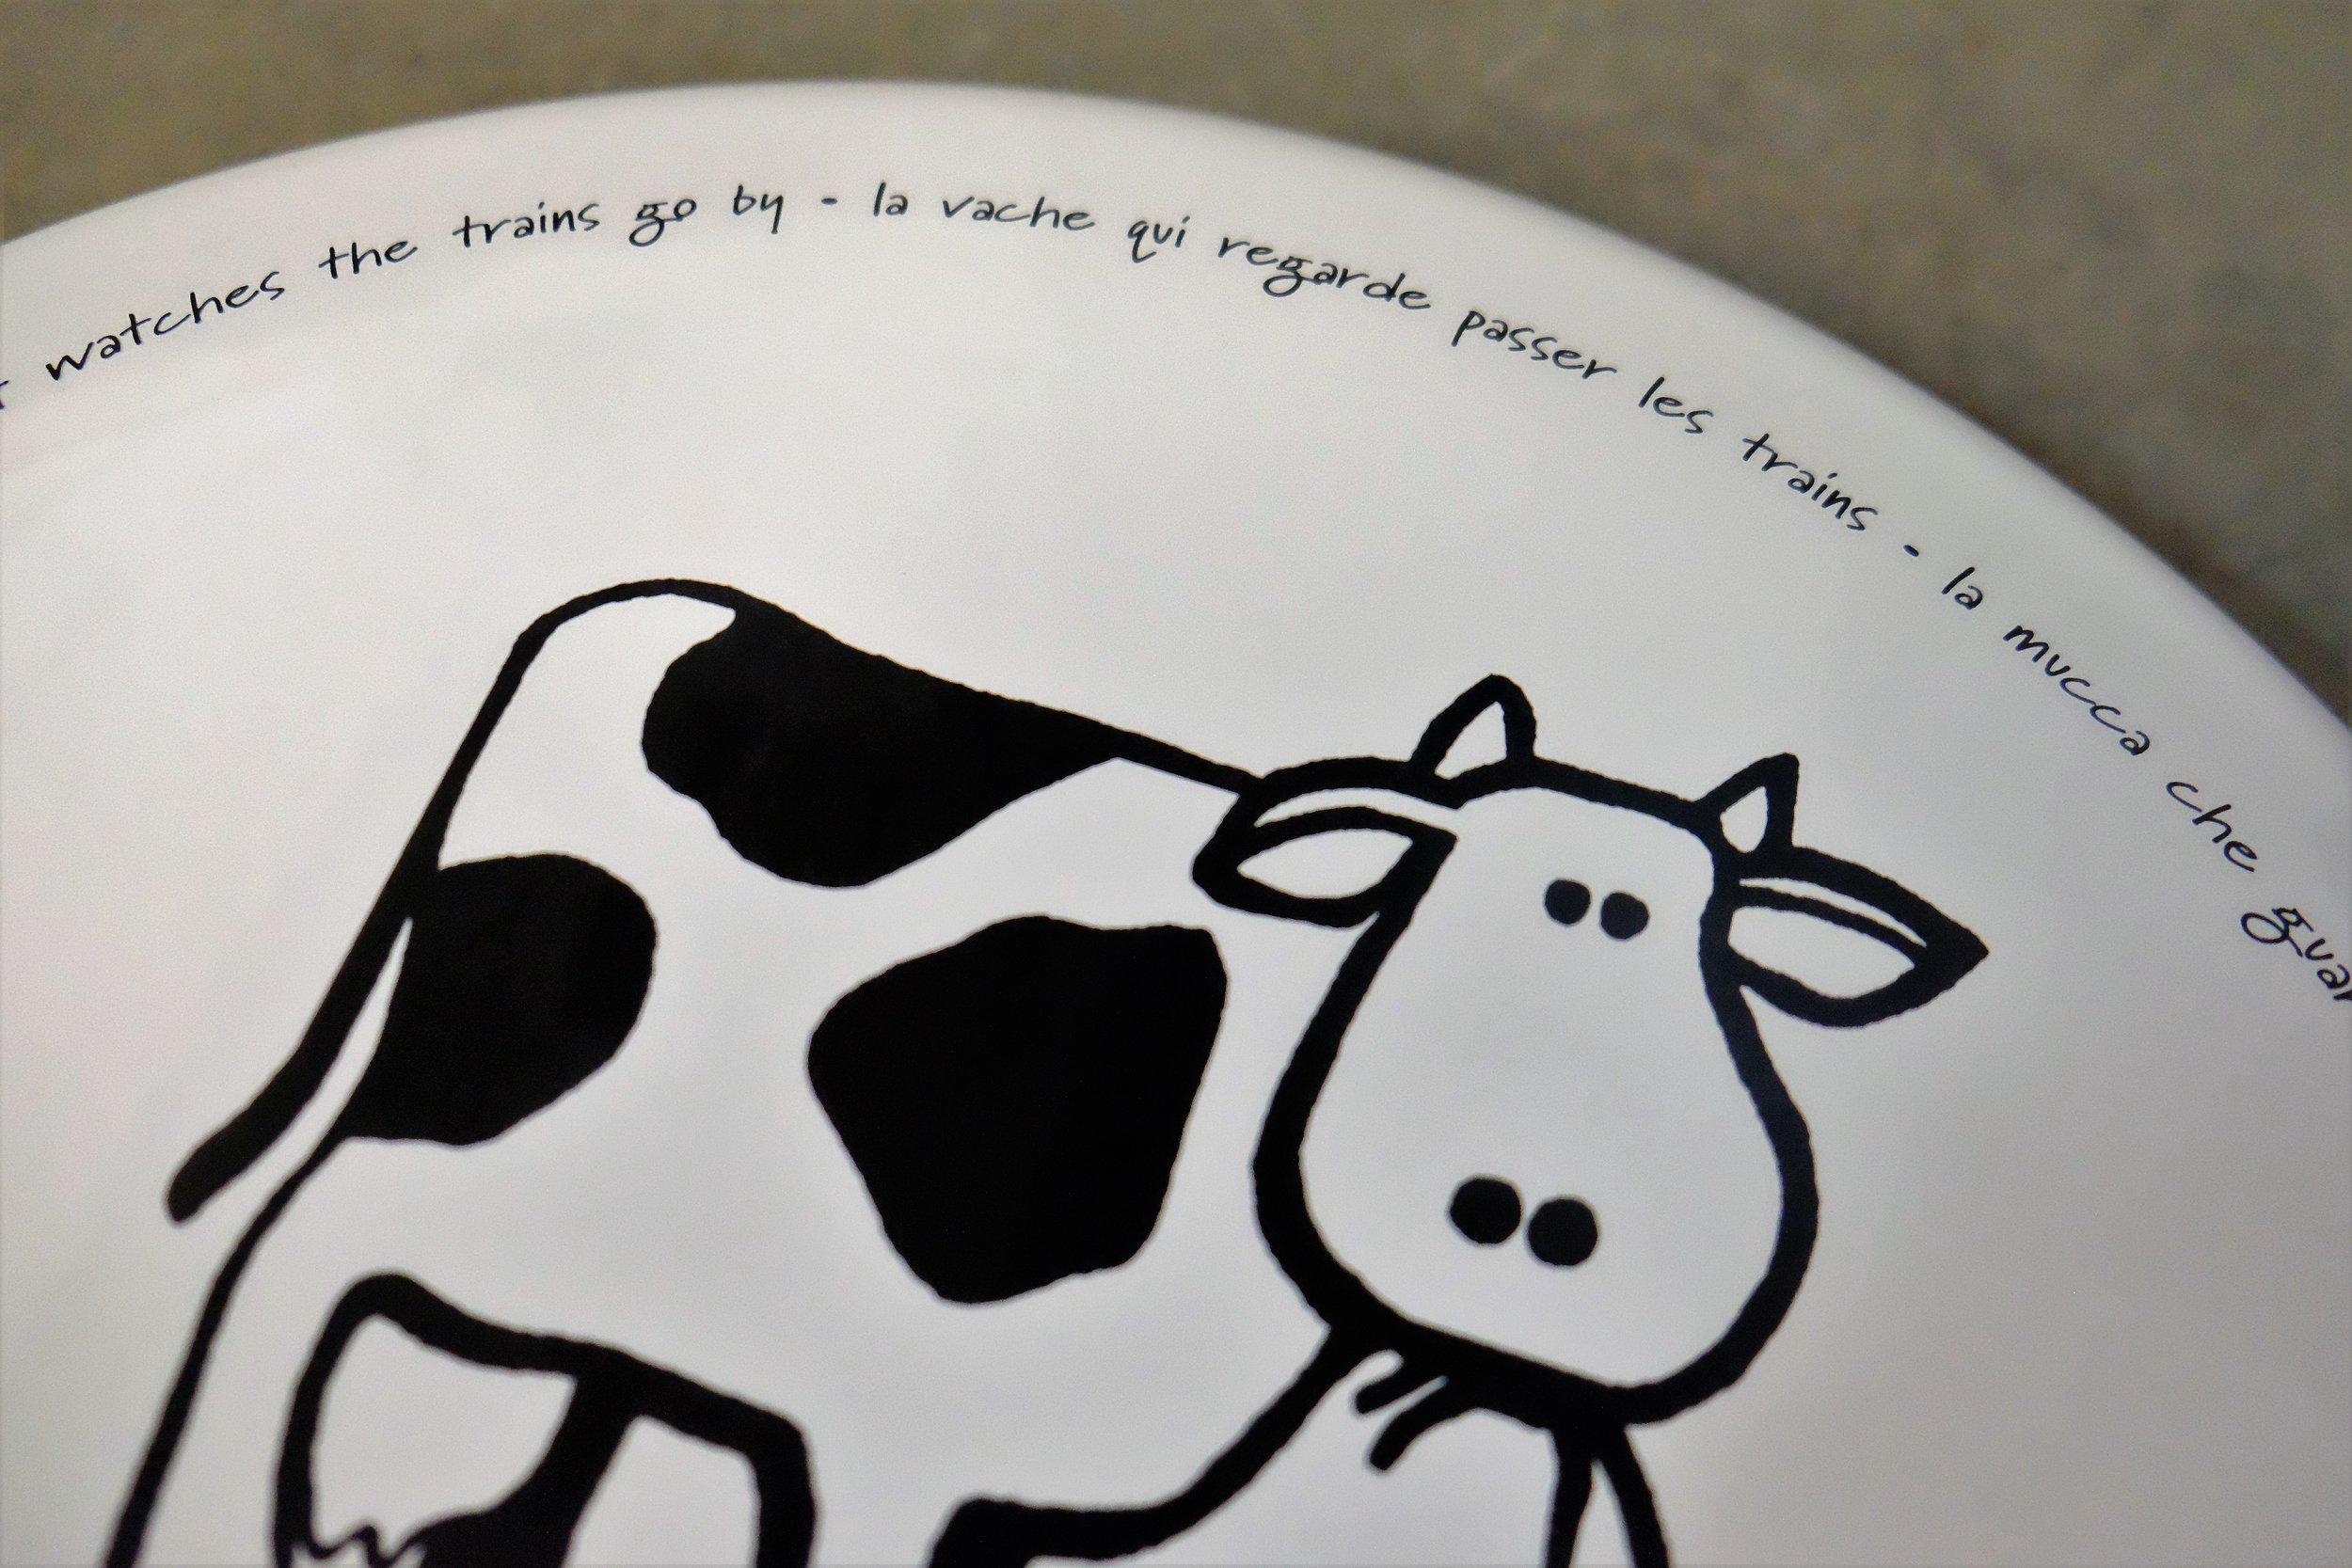 La vache curved 1.jpg